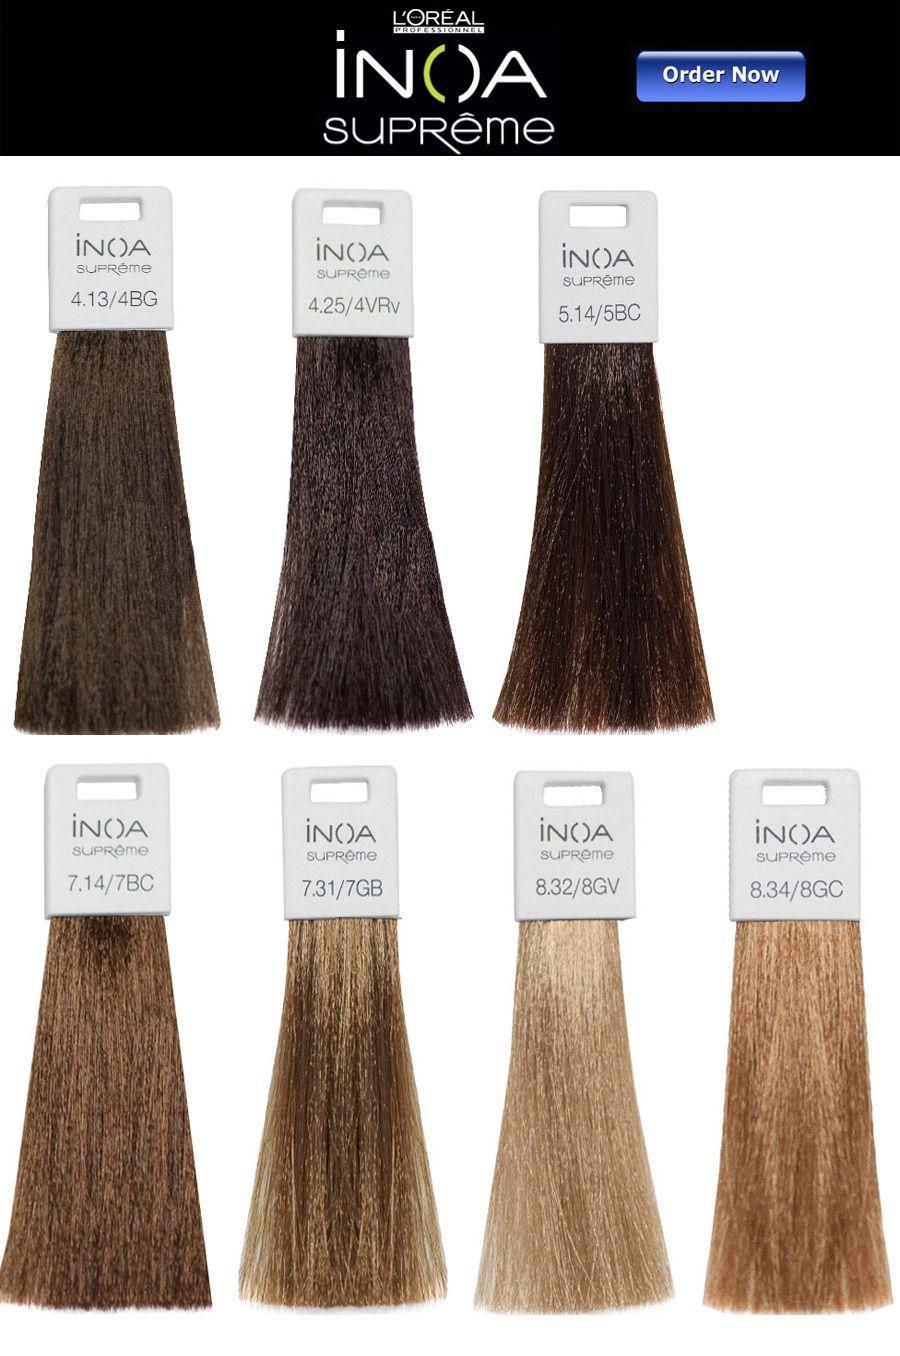 Inoa Hair Color Chart Best New Hair Color Check More At Http Www Fitnursetaylor Com Inoa Hair Color Char Loreal Hair Color Hair Color Chart Loreal Hair Dye